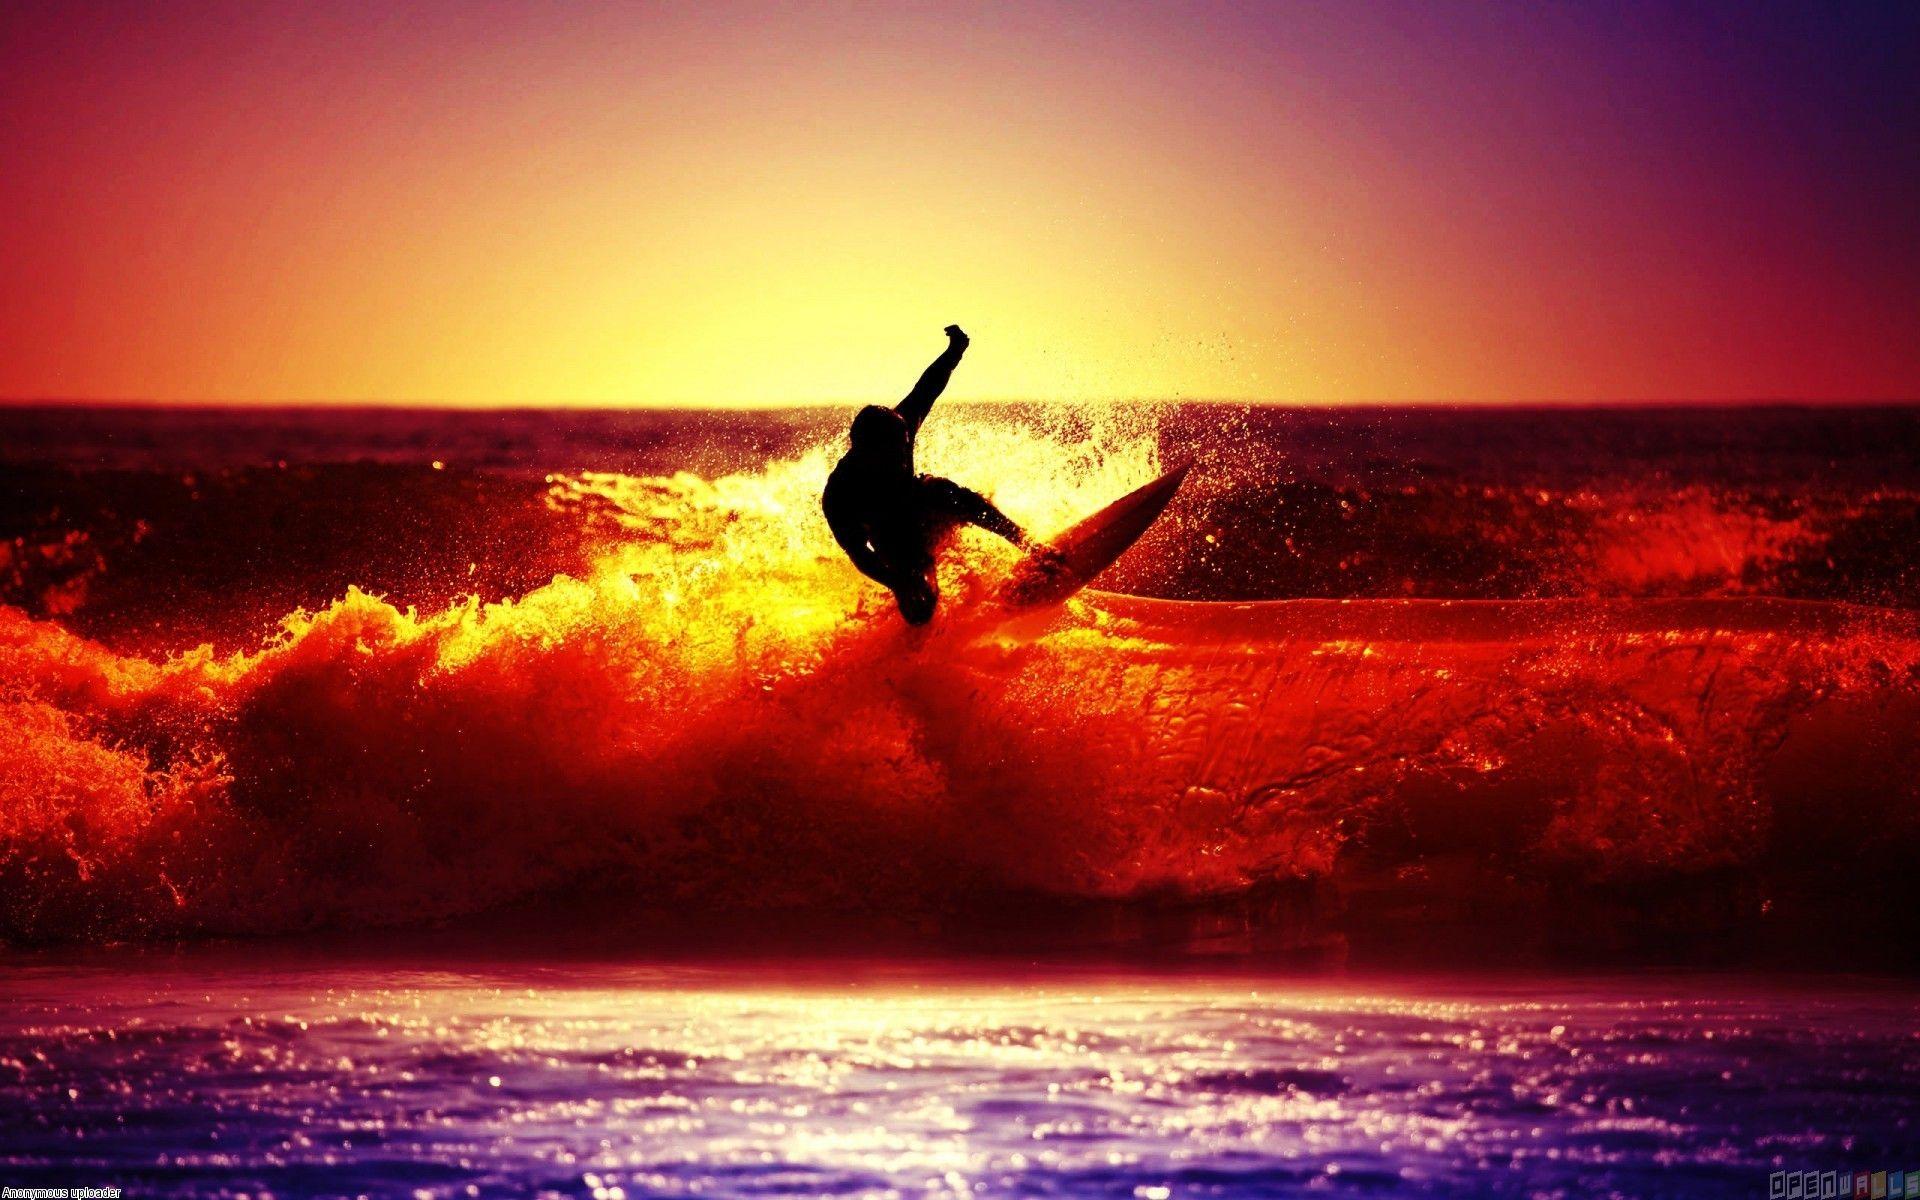 Surfingwavesatsunset Surfing In Sunset Light Wallpaper 19870